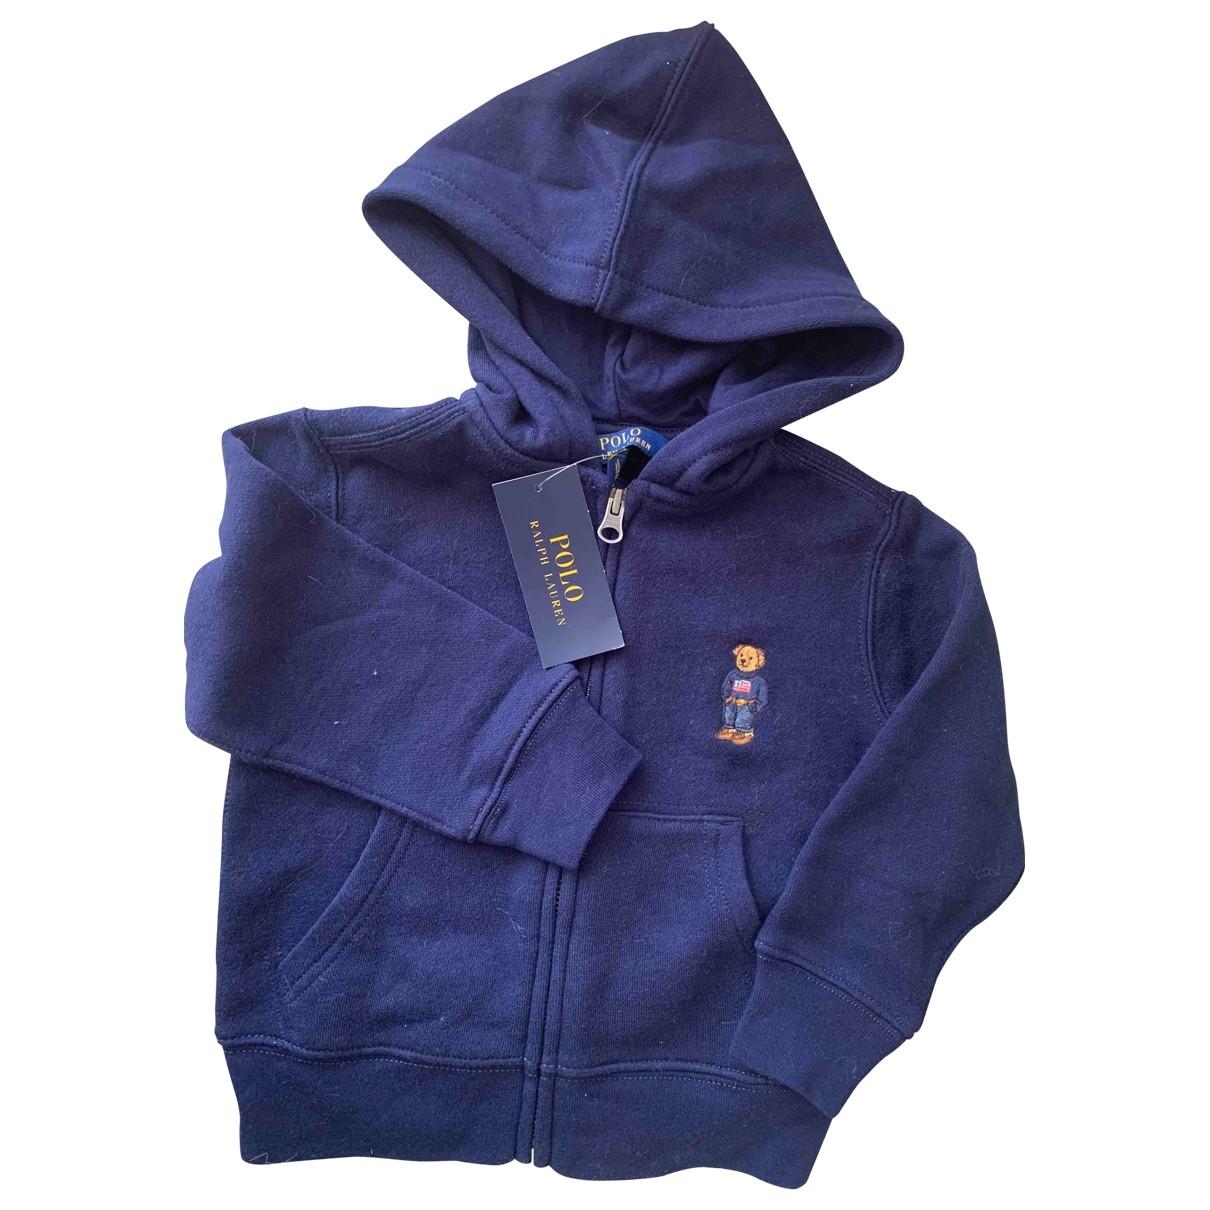 Polo Ralph Lauren \N Pullover, StrickJacke in  Marine Baumwolle